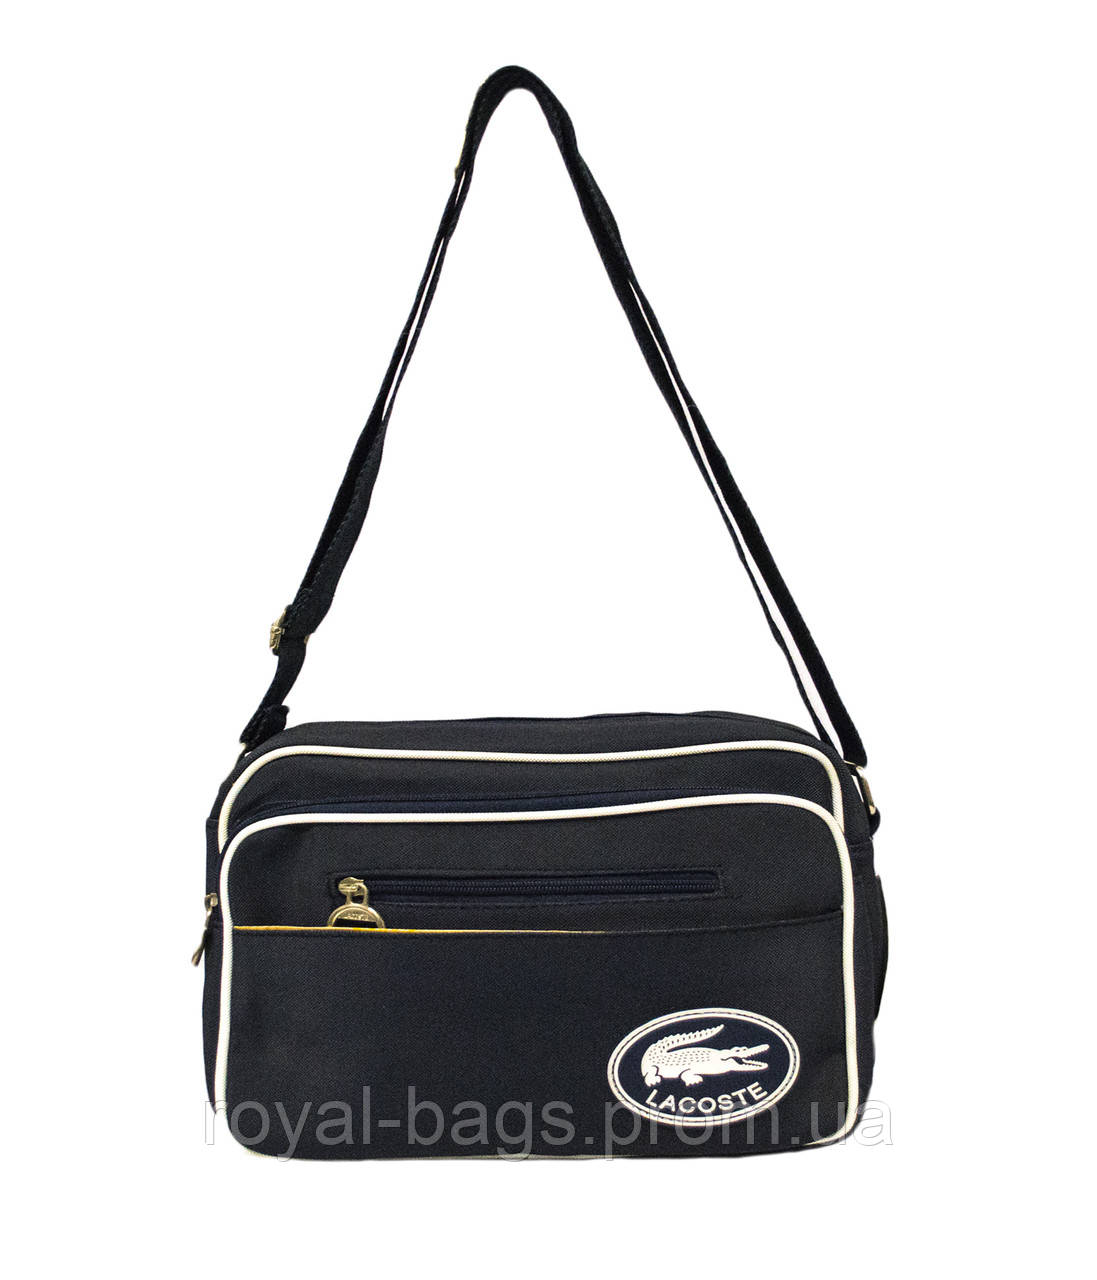 39c3340ca25f Молодежная сумка через плечо Lacoste 3 Цвета Синий - Royal-Bags - Интернет  магазин в